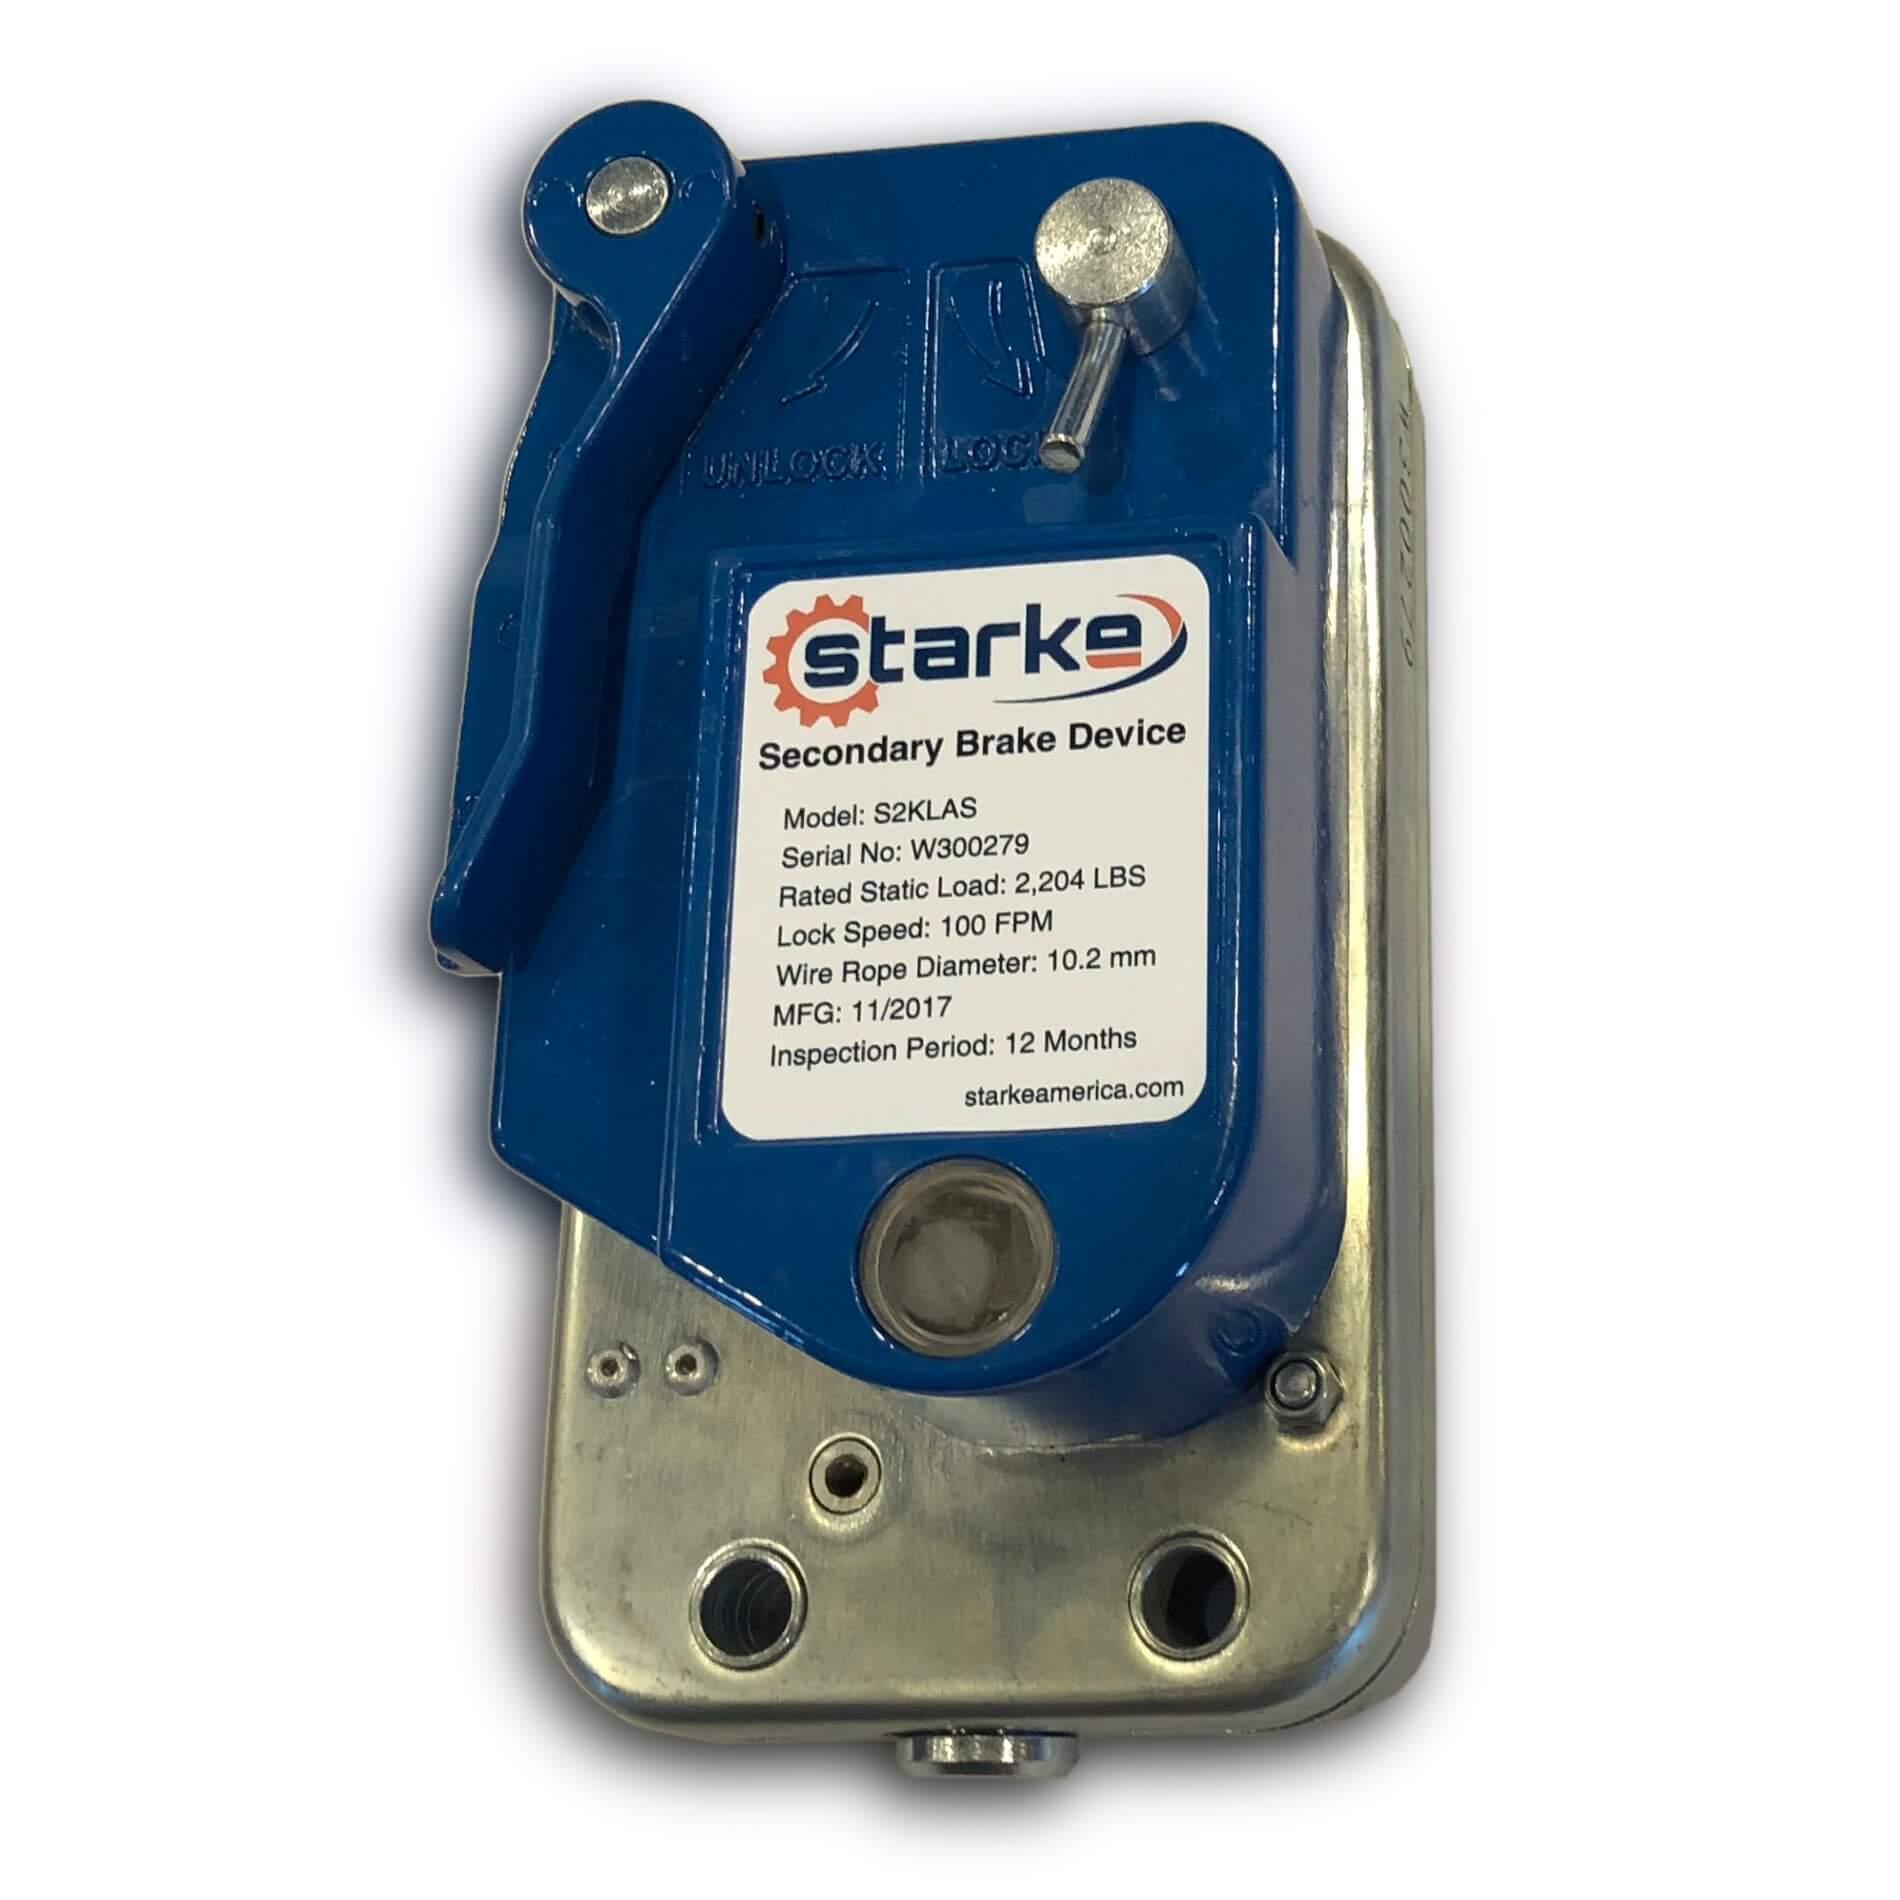 Starke Secondary Brake Device • Hoist Zone